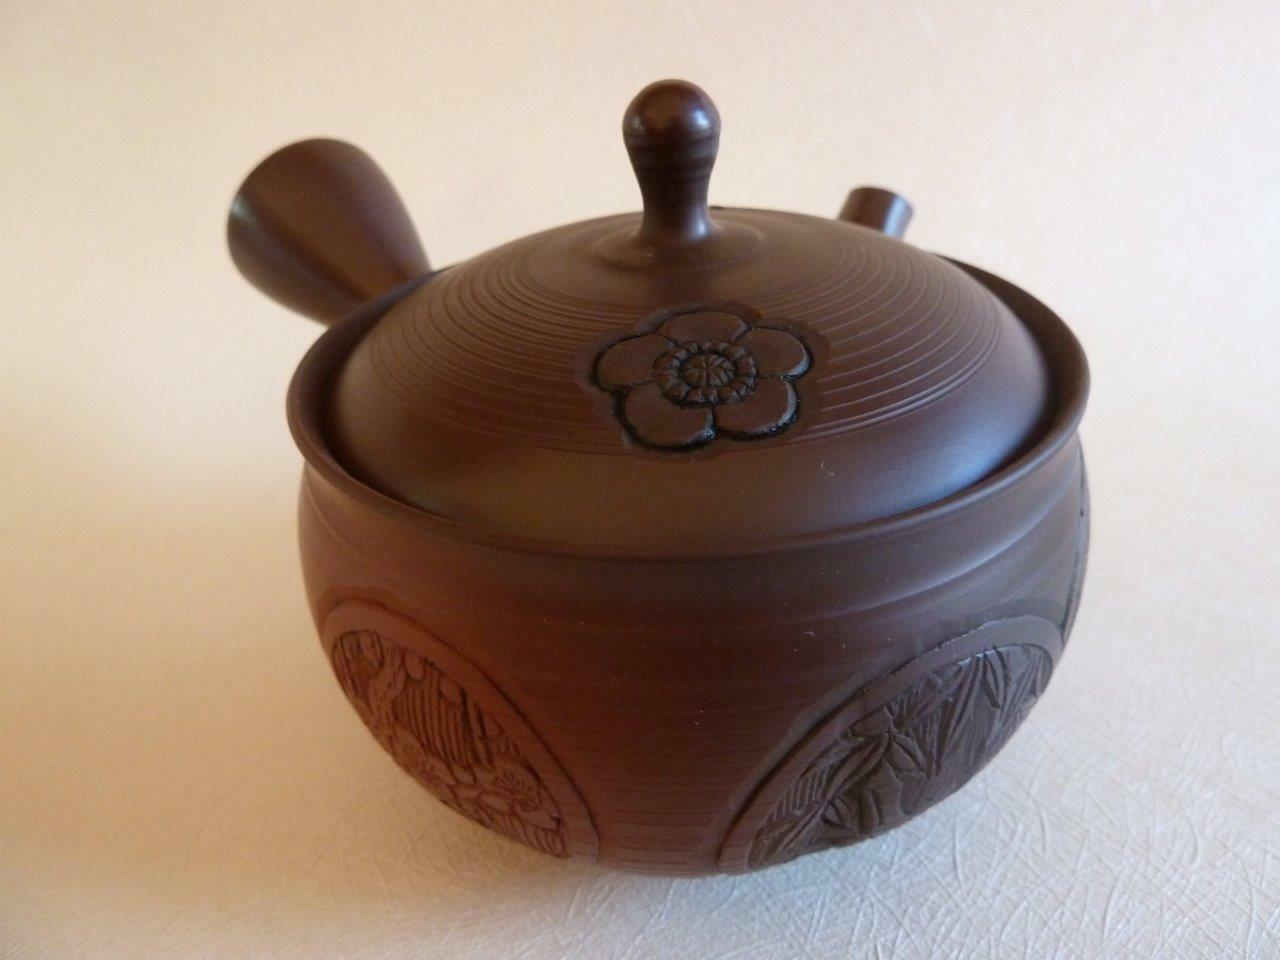 Tokoname Japonais théière, Kyusu, Gyokuryu, teapot, porte-bonheur symboles, Teapot